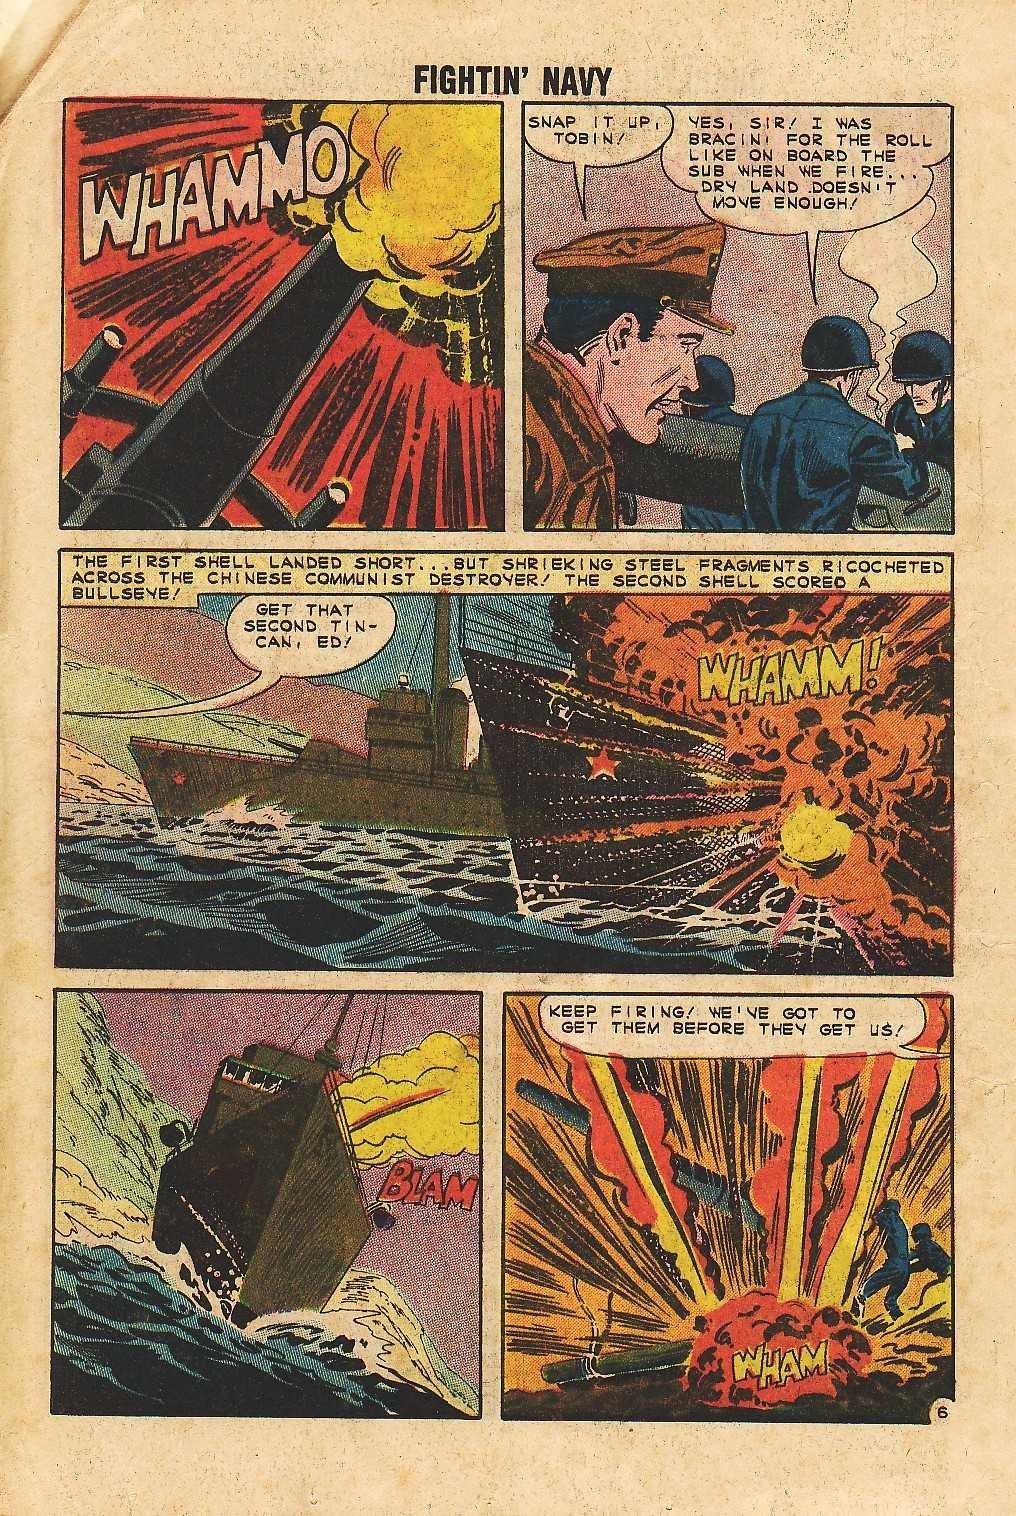 Read online Fightin' Navy comic -  Issue #105 - 20